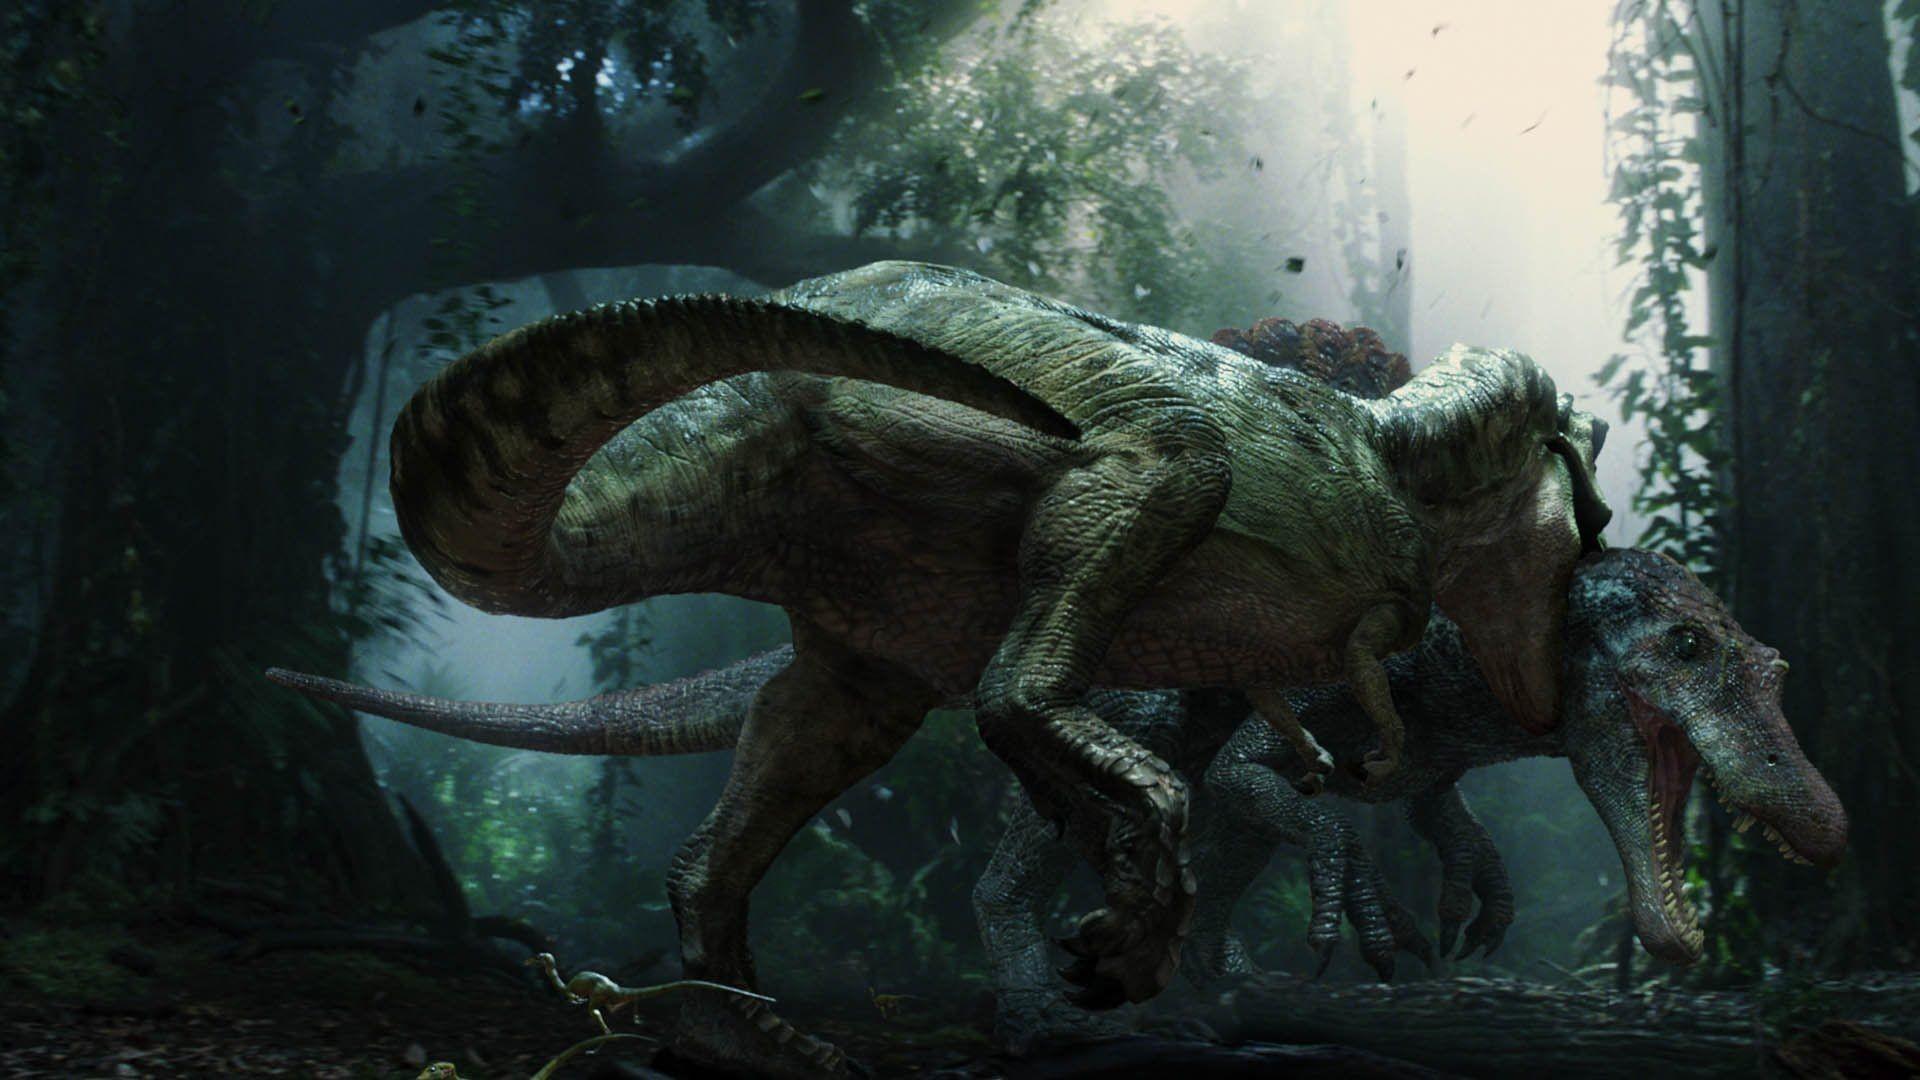 Res: 1920x1080, Jurassic World: Breakout (Fan Trailer) - Jurassic World Sequel .